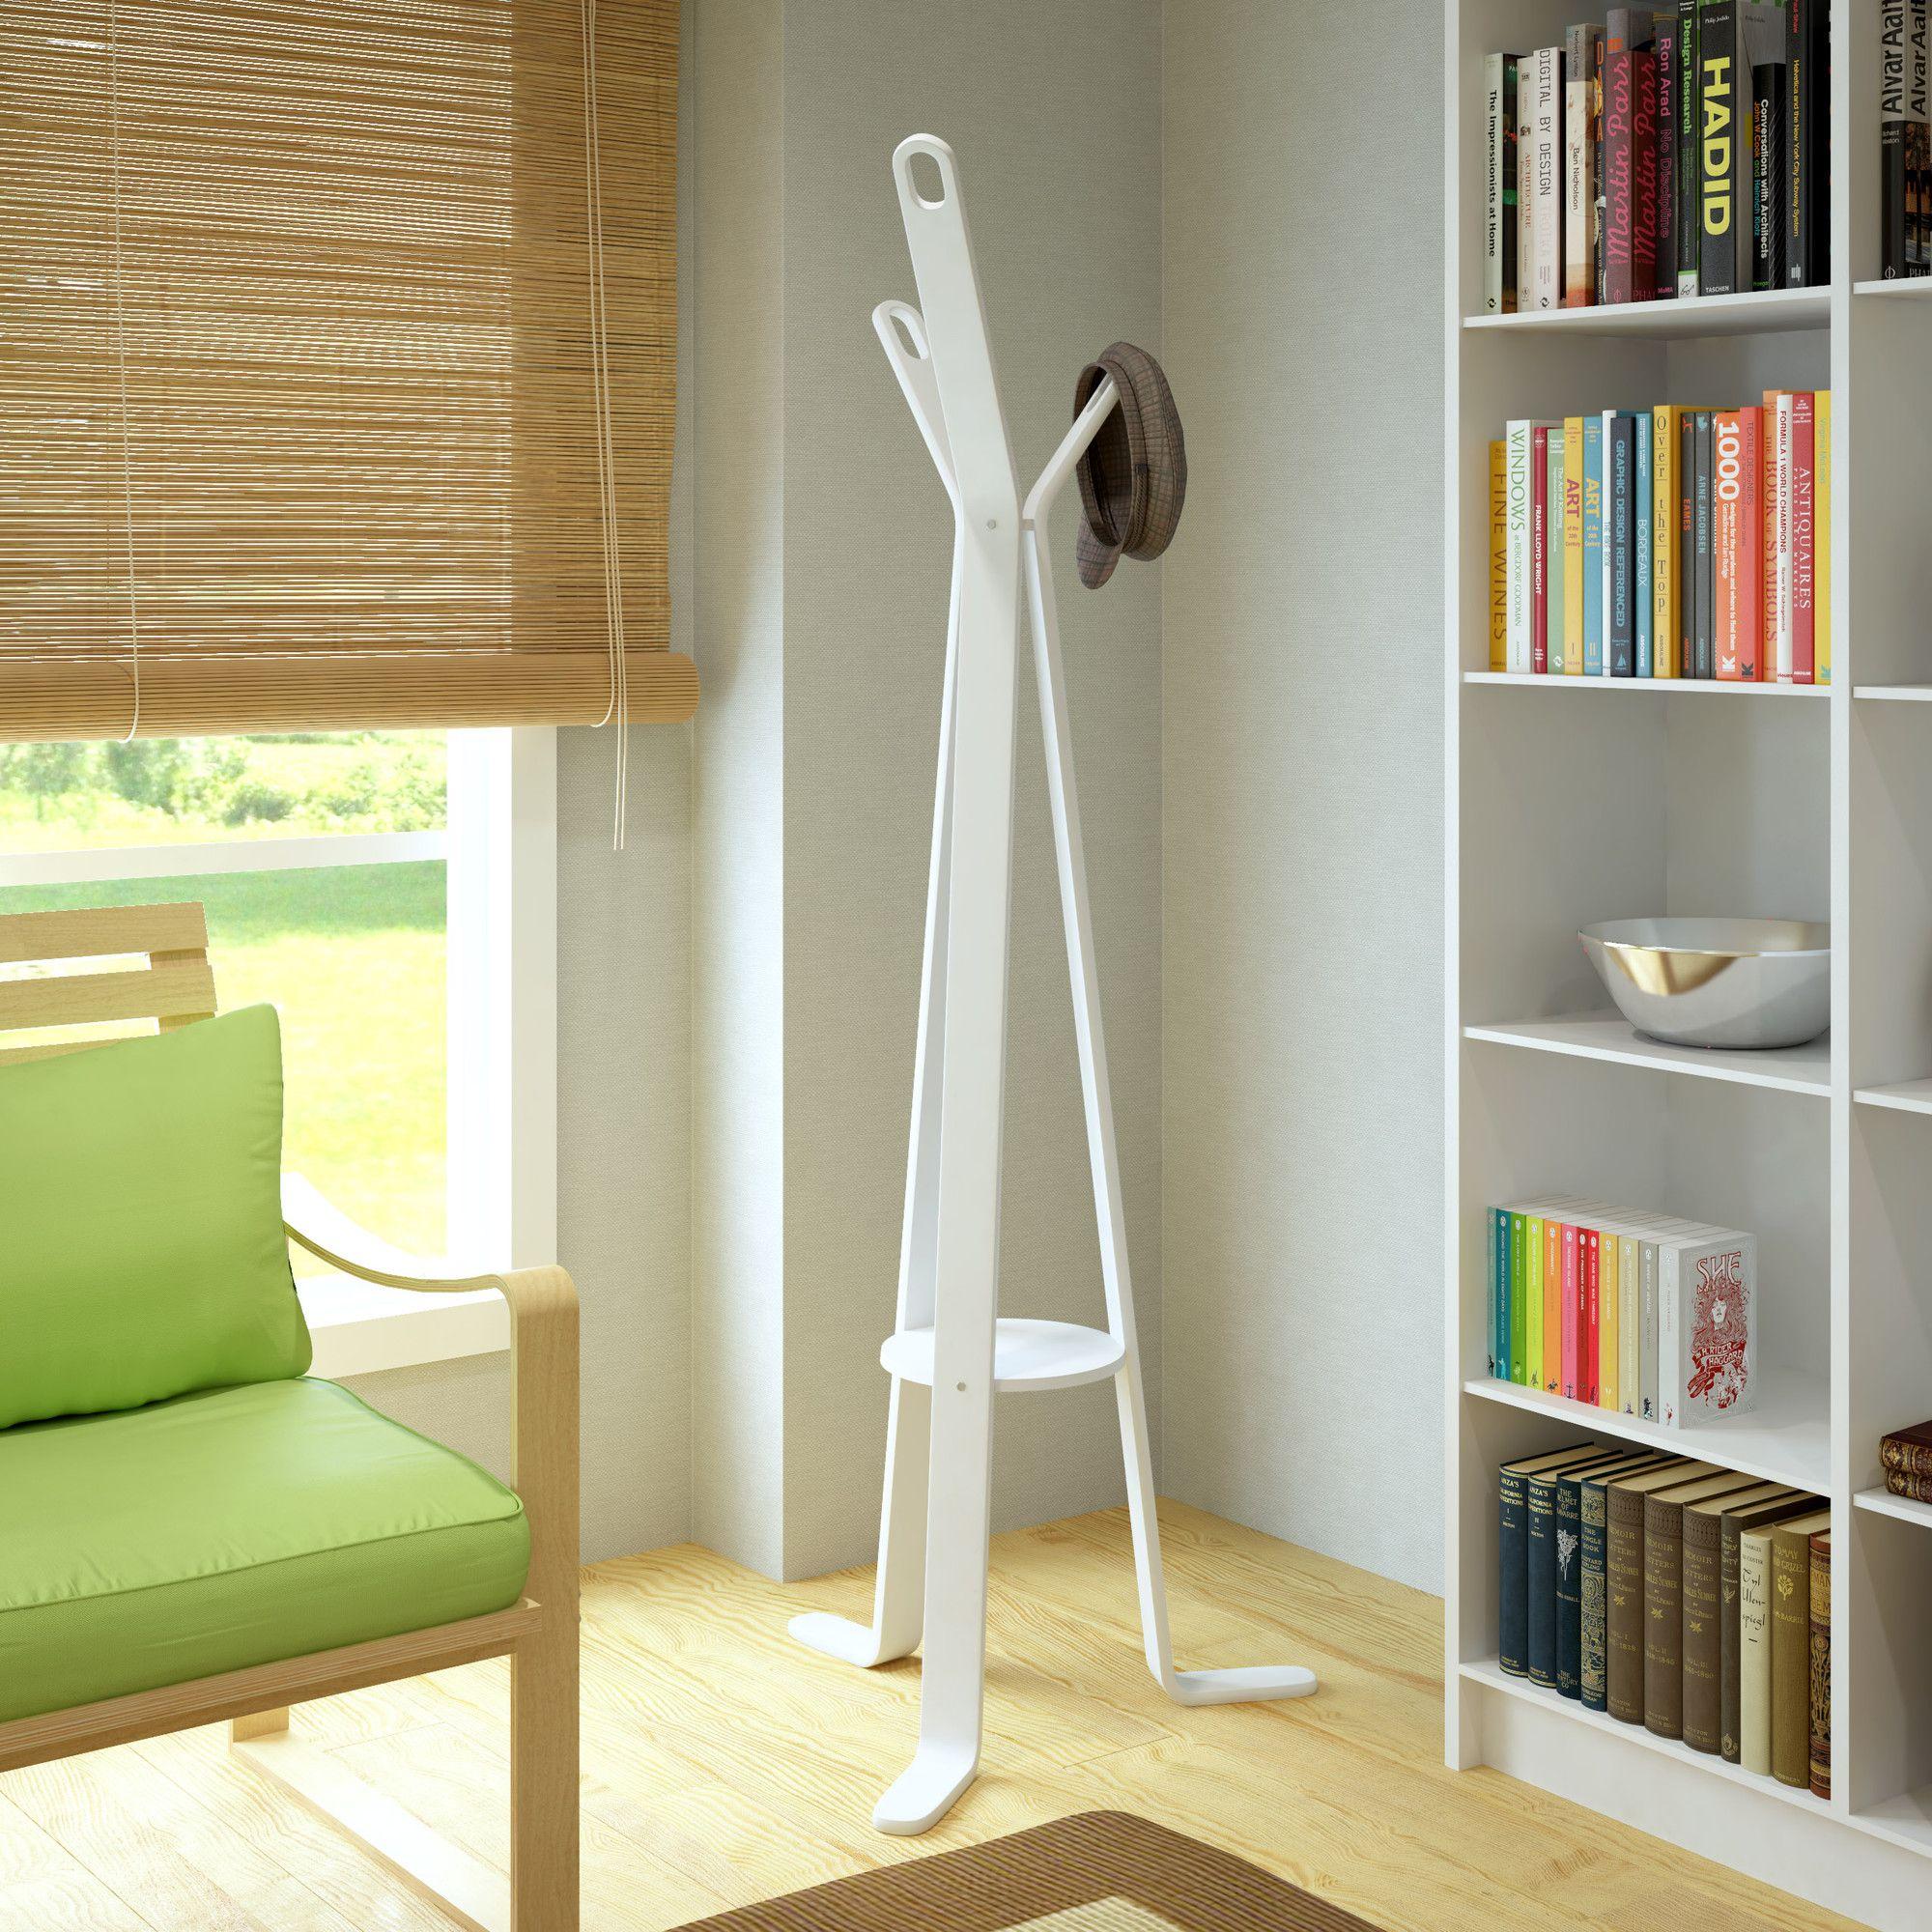 dcor design aquios bentwood coat rack  allmodern. dcor design aquios bentwood coat rack  allmodern  casa de geek